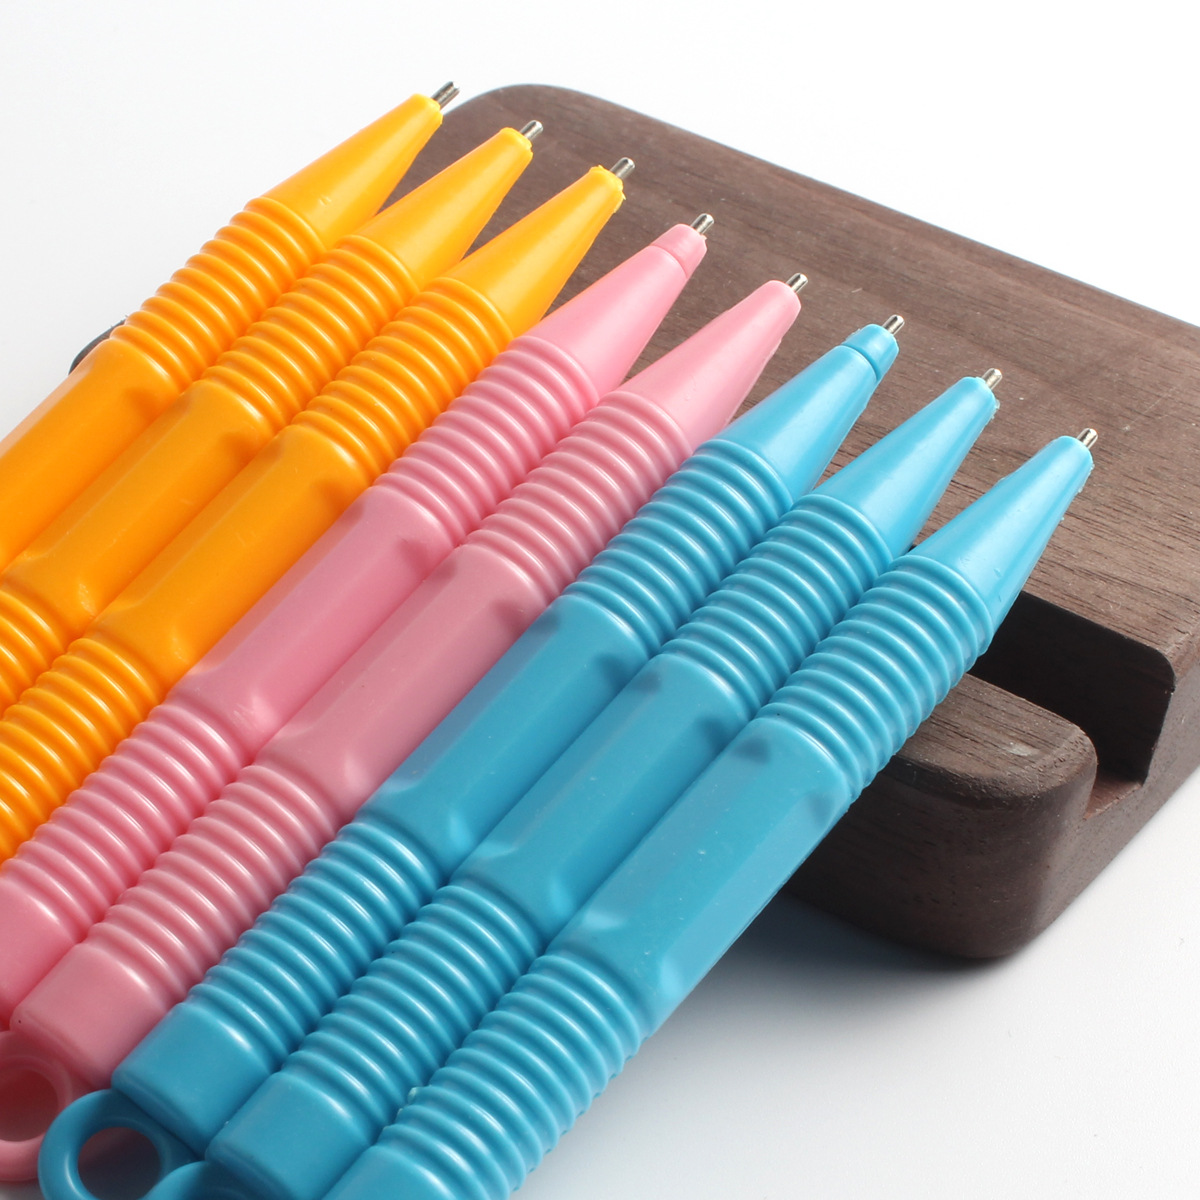 Magnetic Doing Homework Only Pen Children Large Size Drawing Board Color Doing Homework Pen Baby Backup Brush